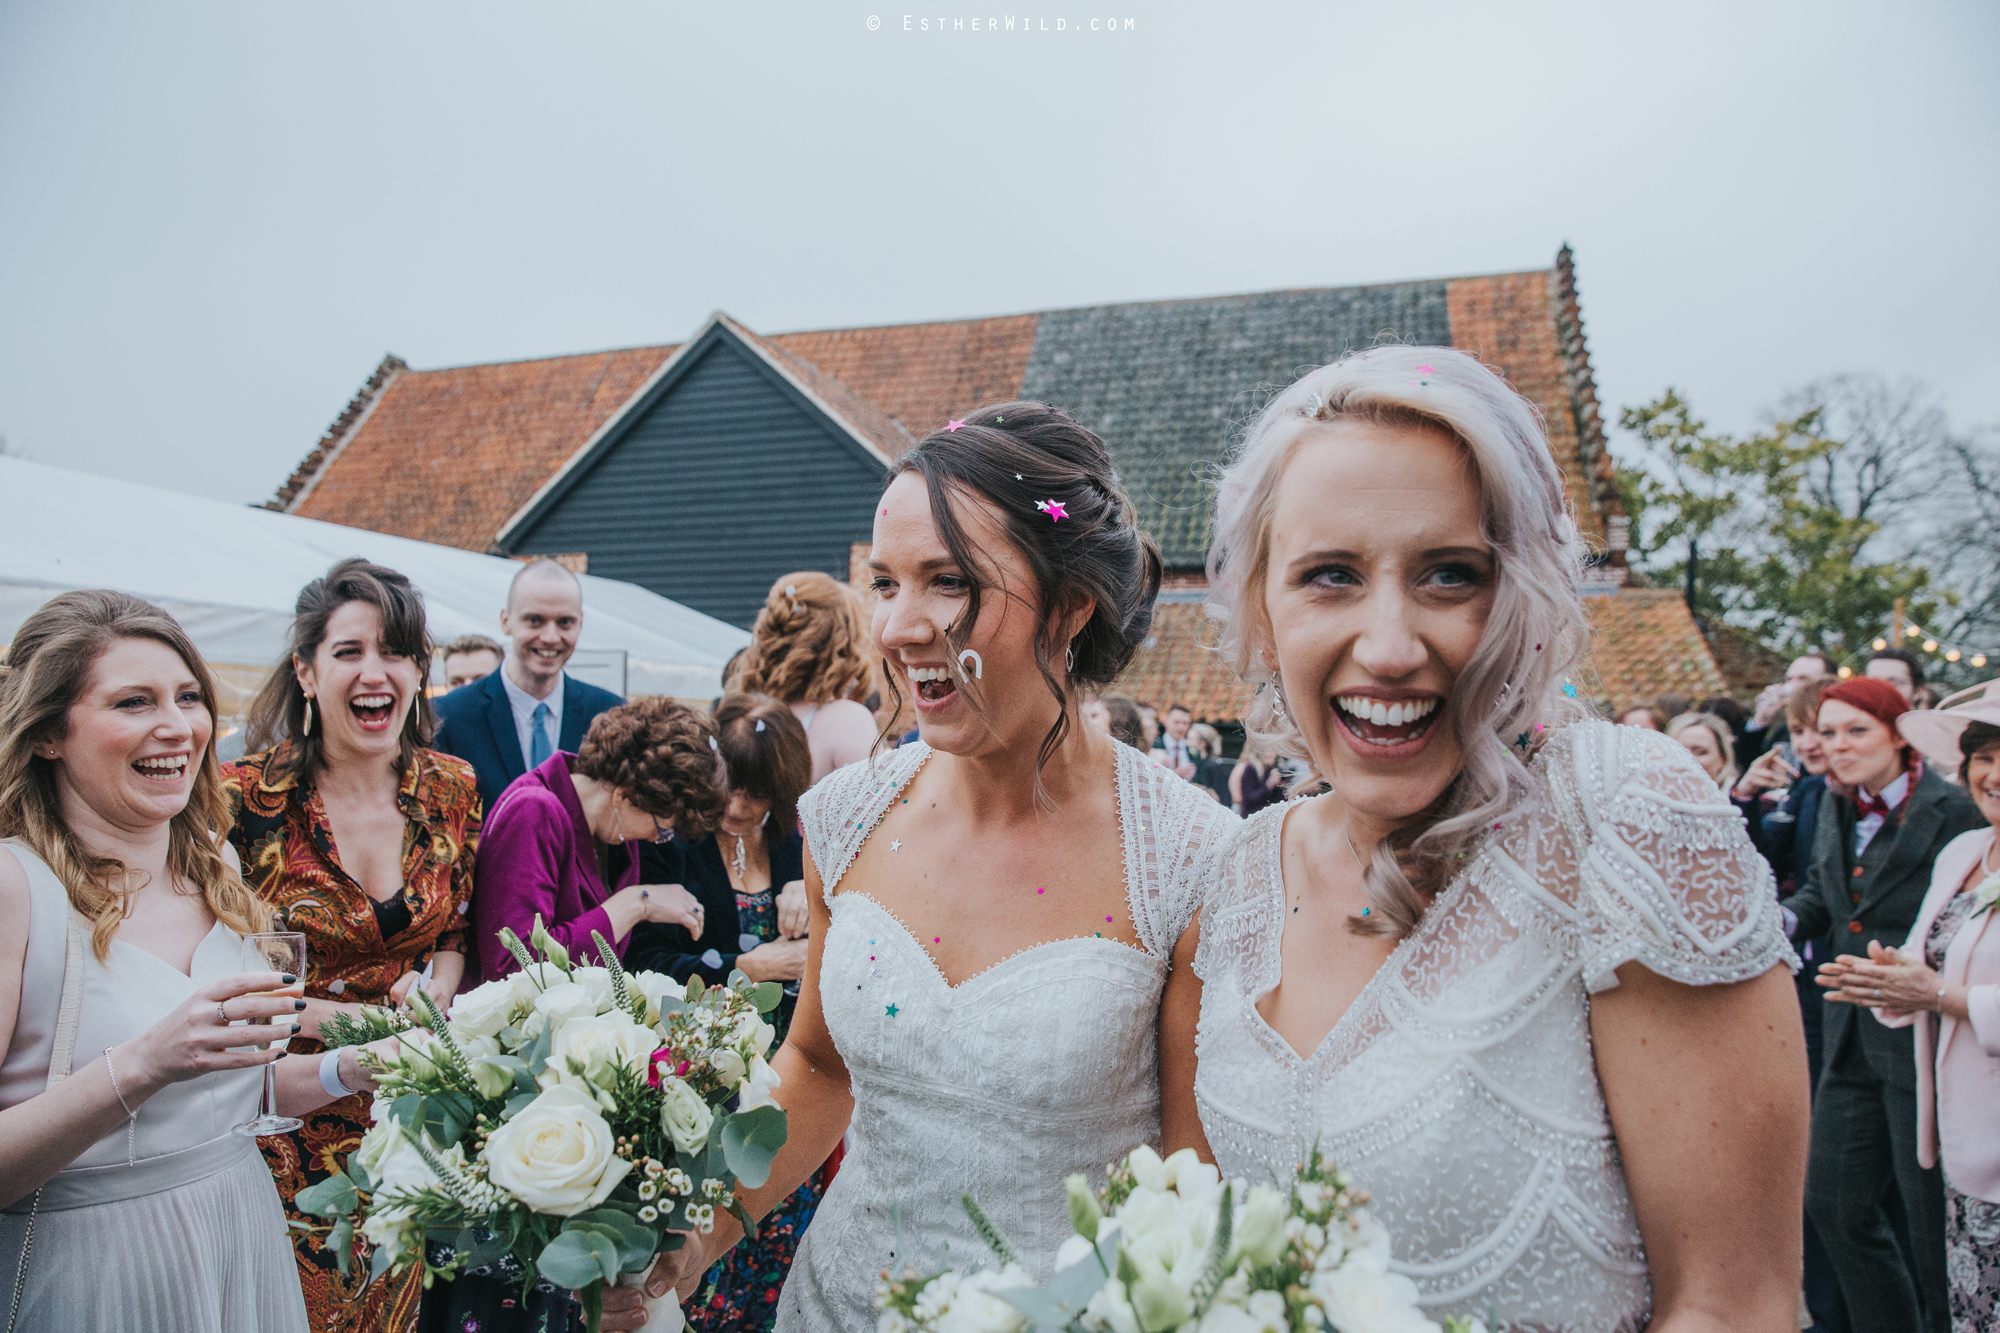 Elms_Barn_Weddings_Suffolk_Photographer_Copyright_Esther_Wild_IMG_1512.jpg